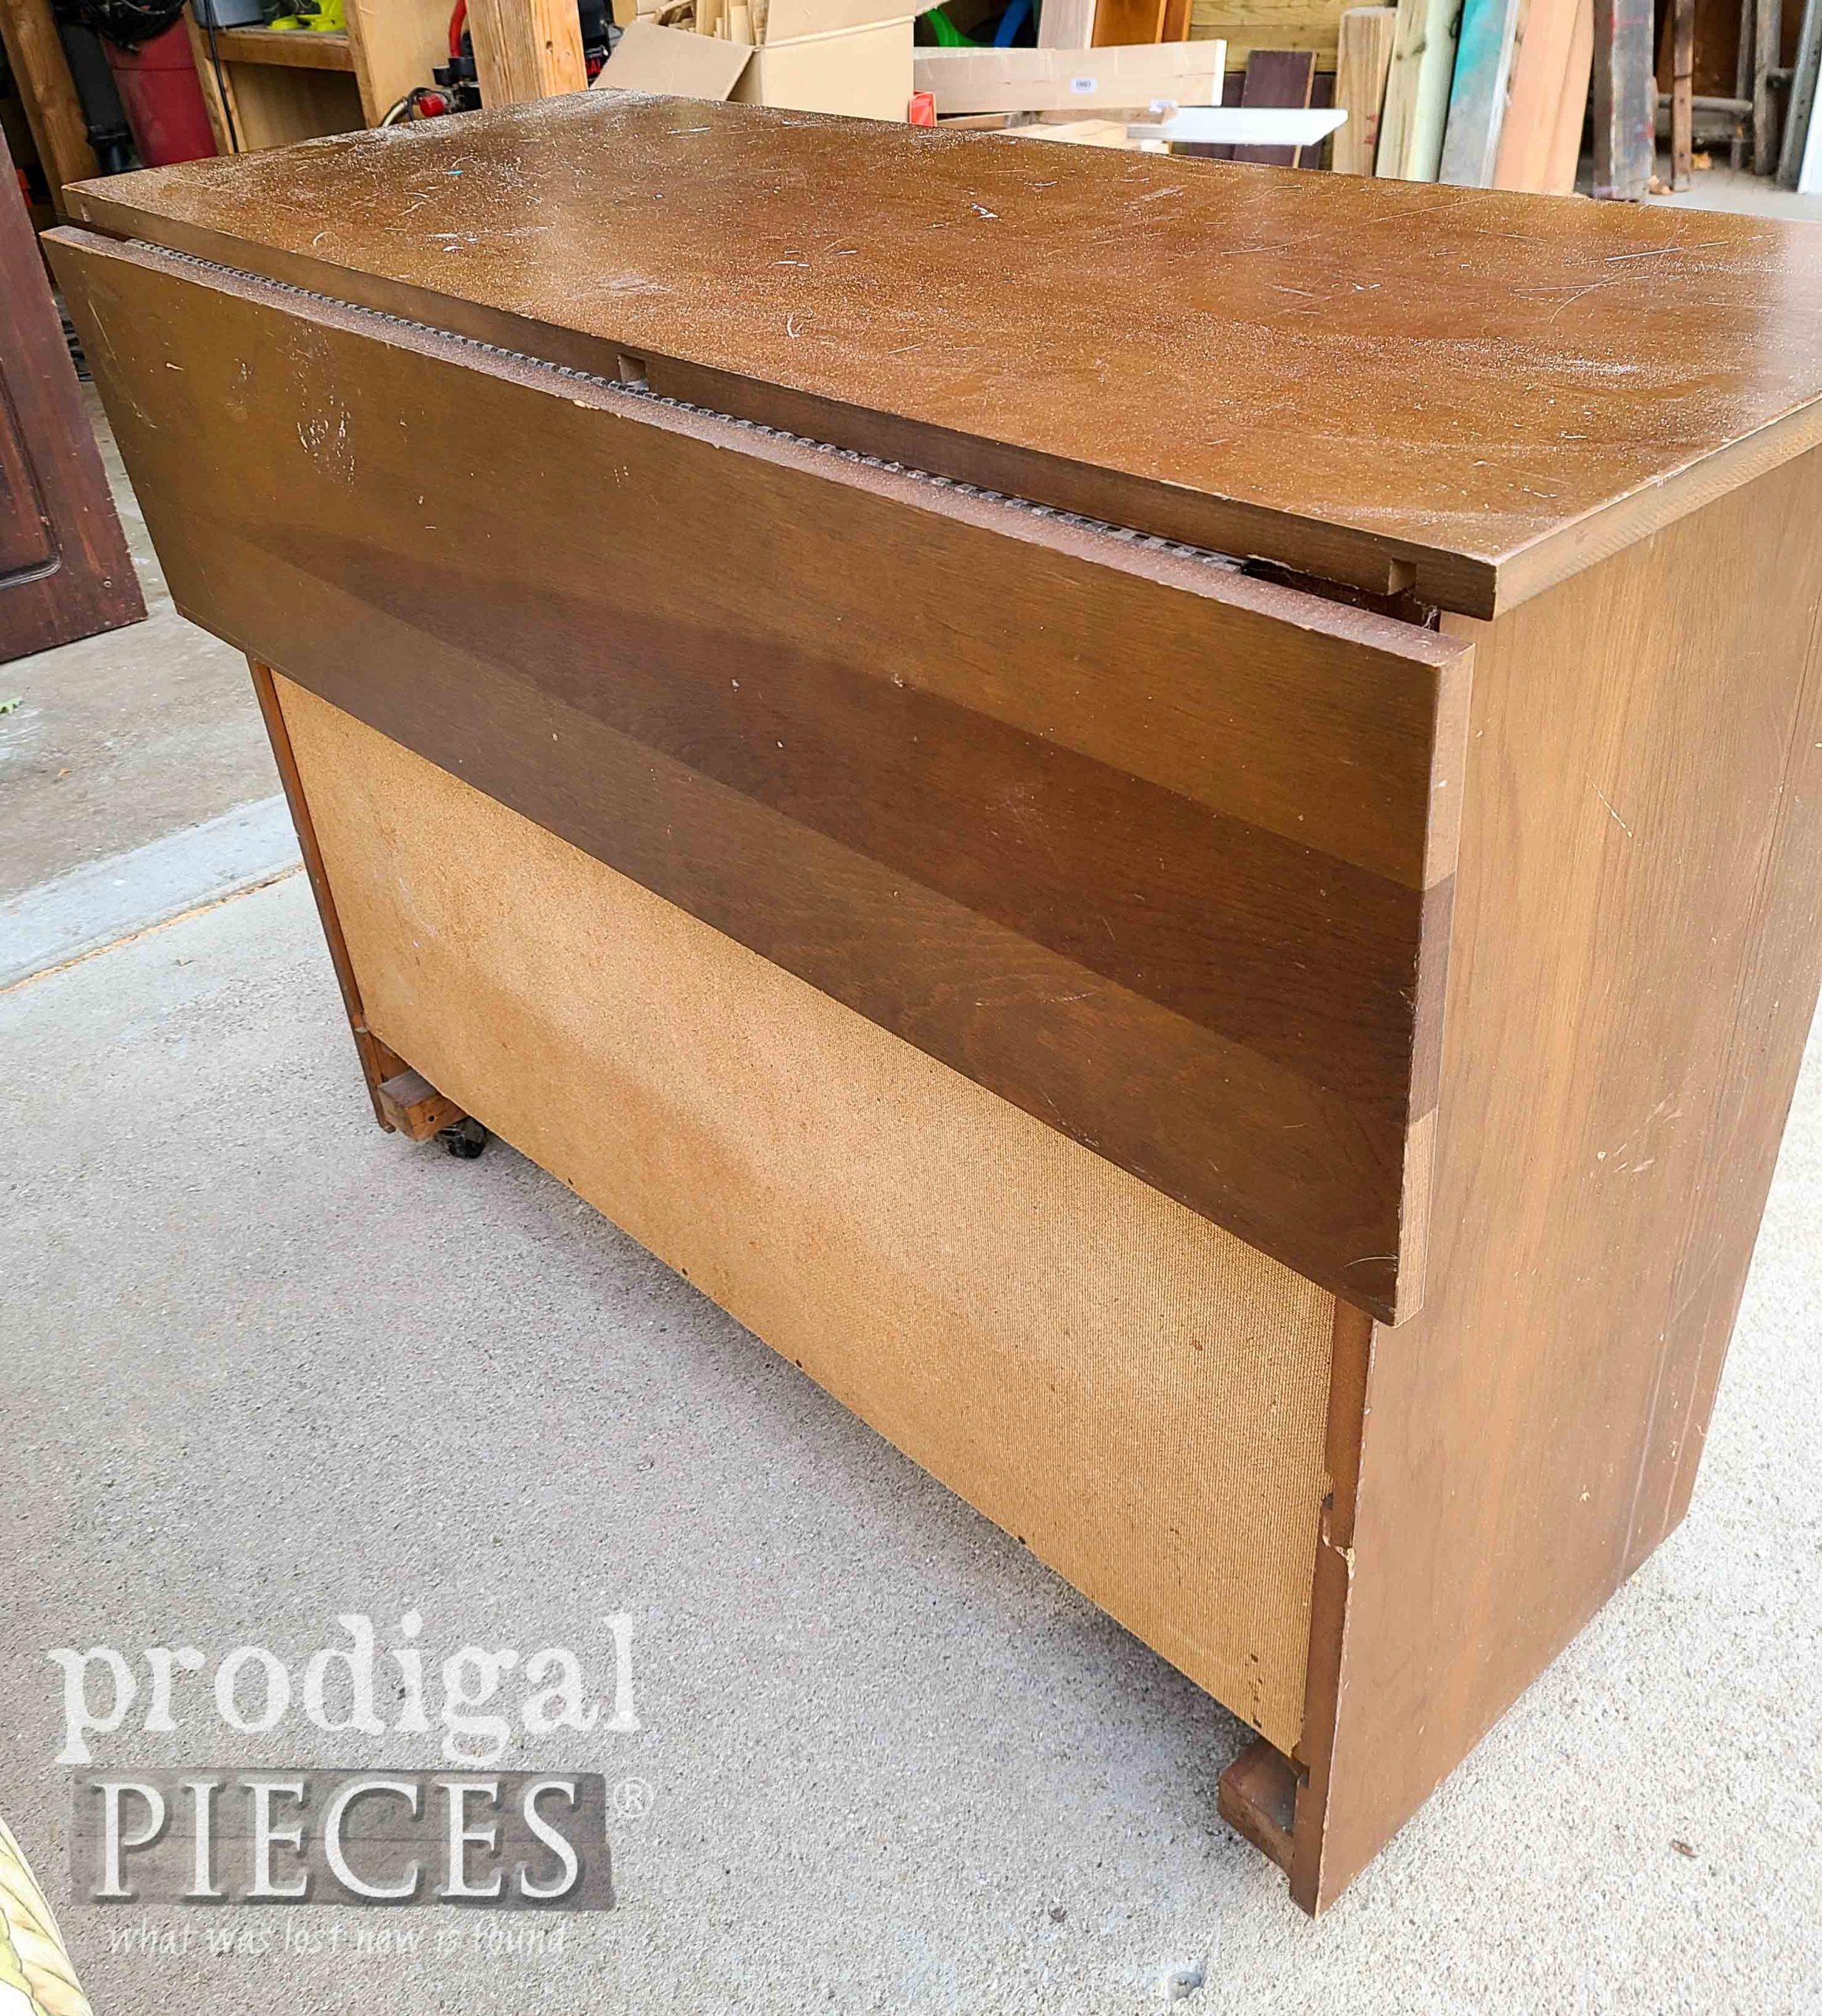 Cabinet Drop Leaf | prodigalpieces.com